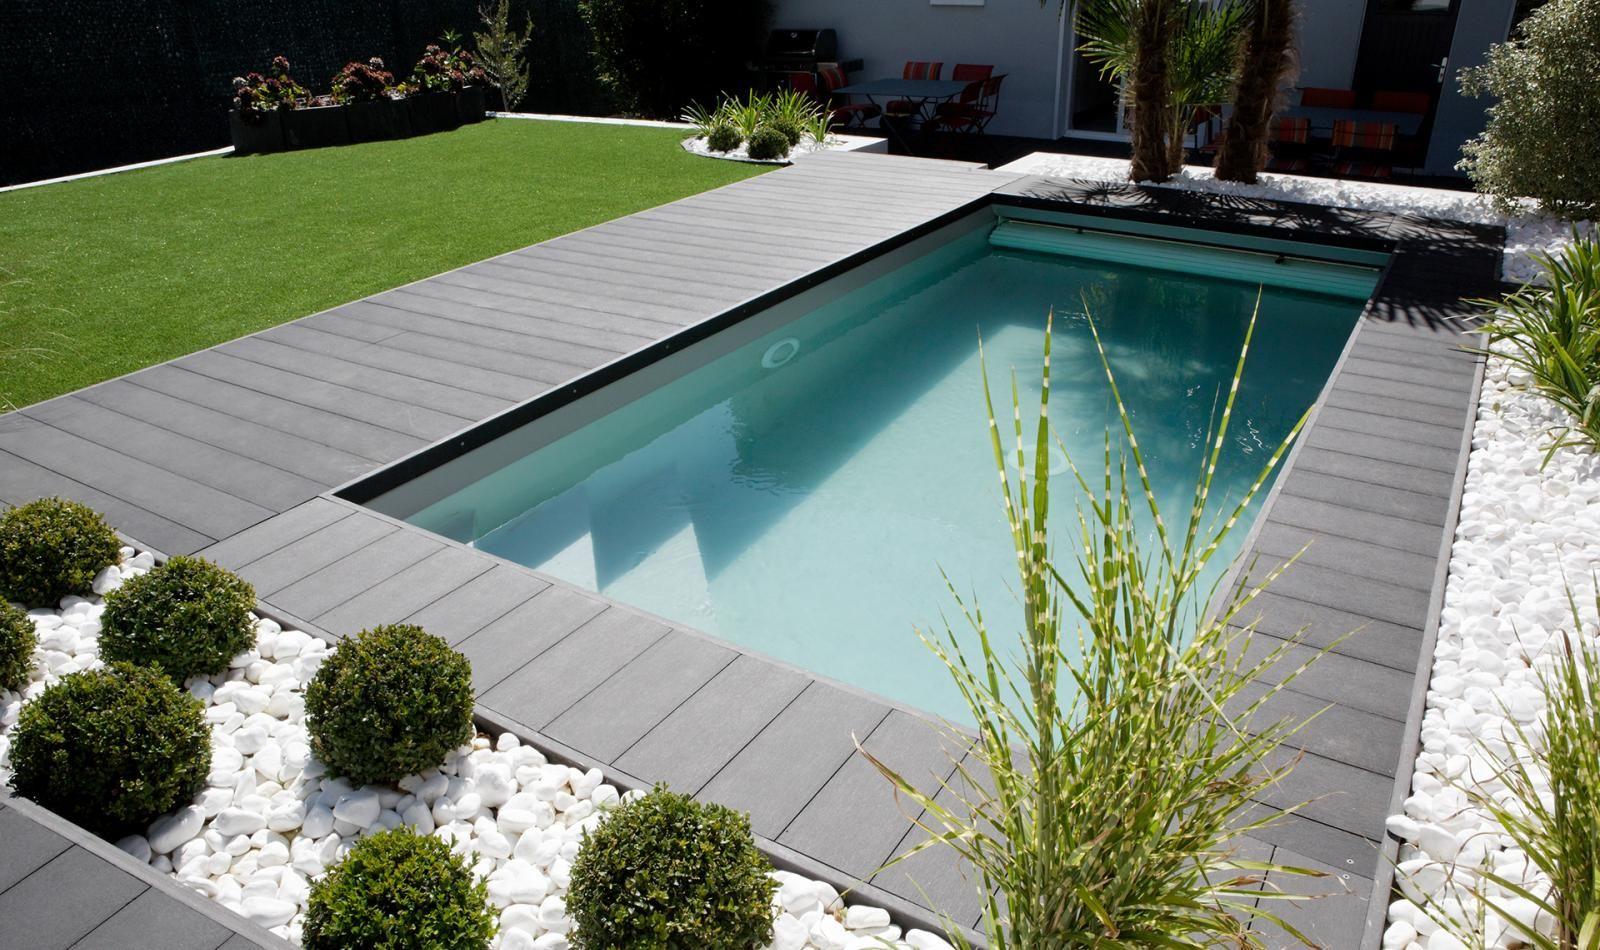 Piscine urbaine 2 2x4 5m liner gris clair smartcover deco idee en 2019 piscine urbaine mini - Tour de piscine en bois ...